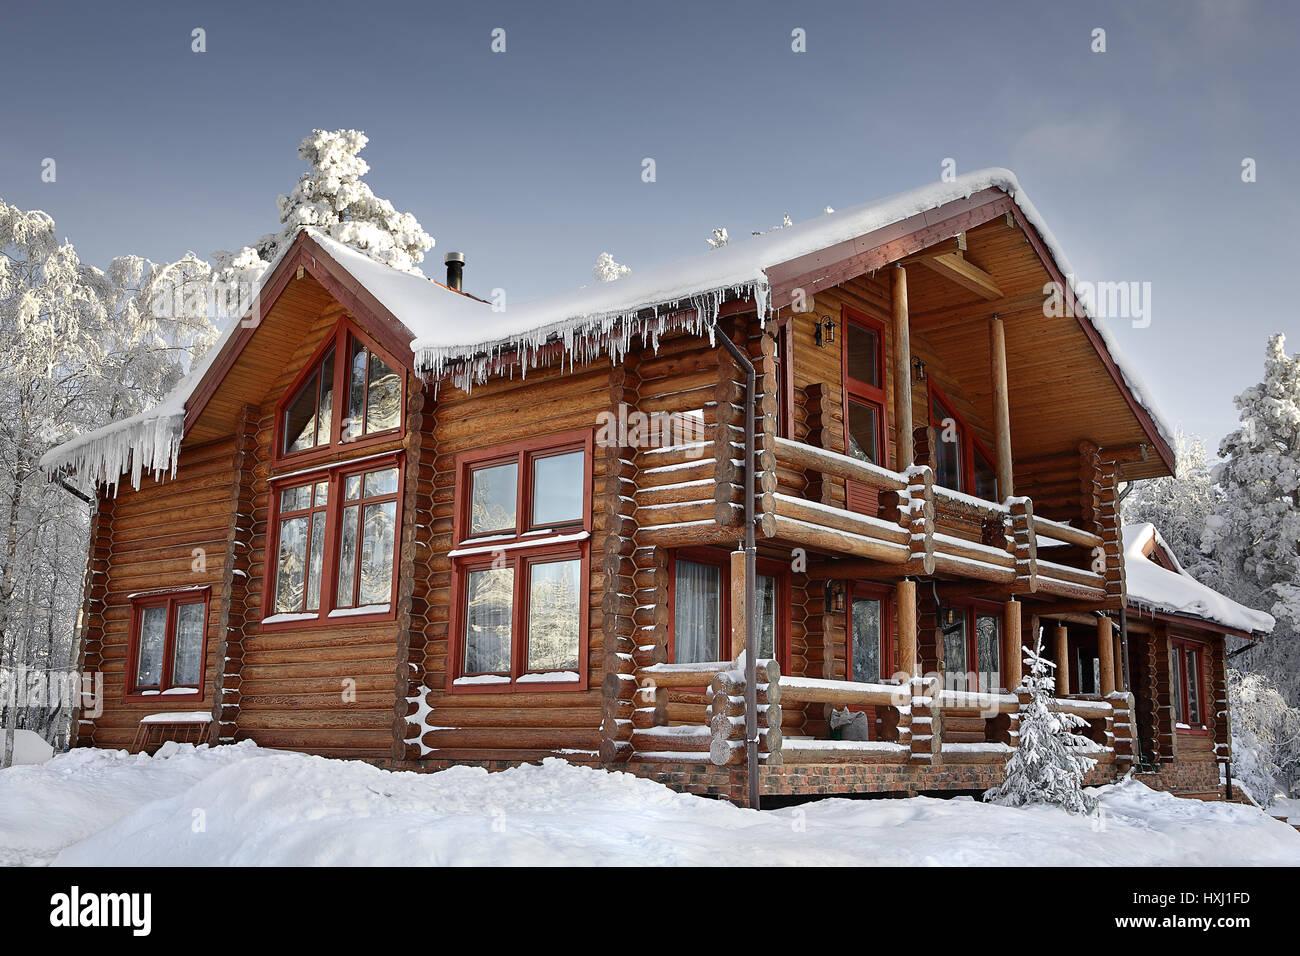 timbered cottage winter stockfotos timbered cottage winter bilder alamy. Black Bedroom Furniture Sets. Home Design Ideas